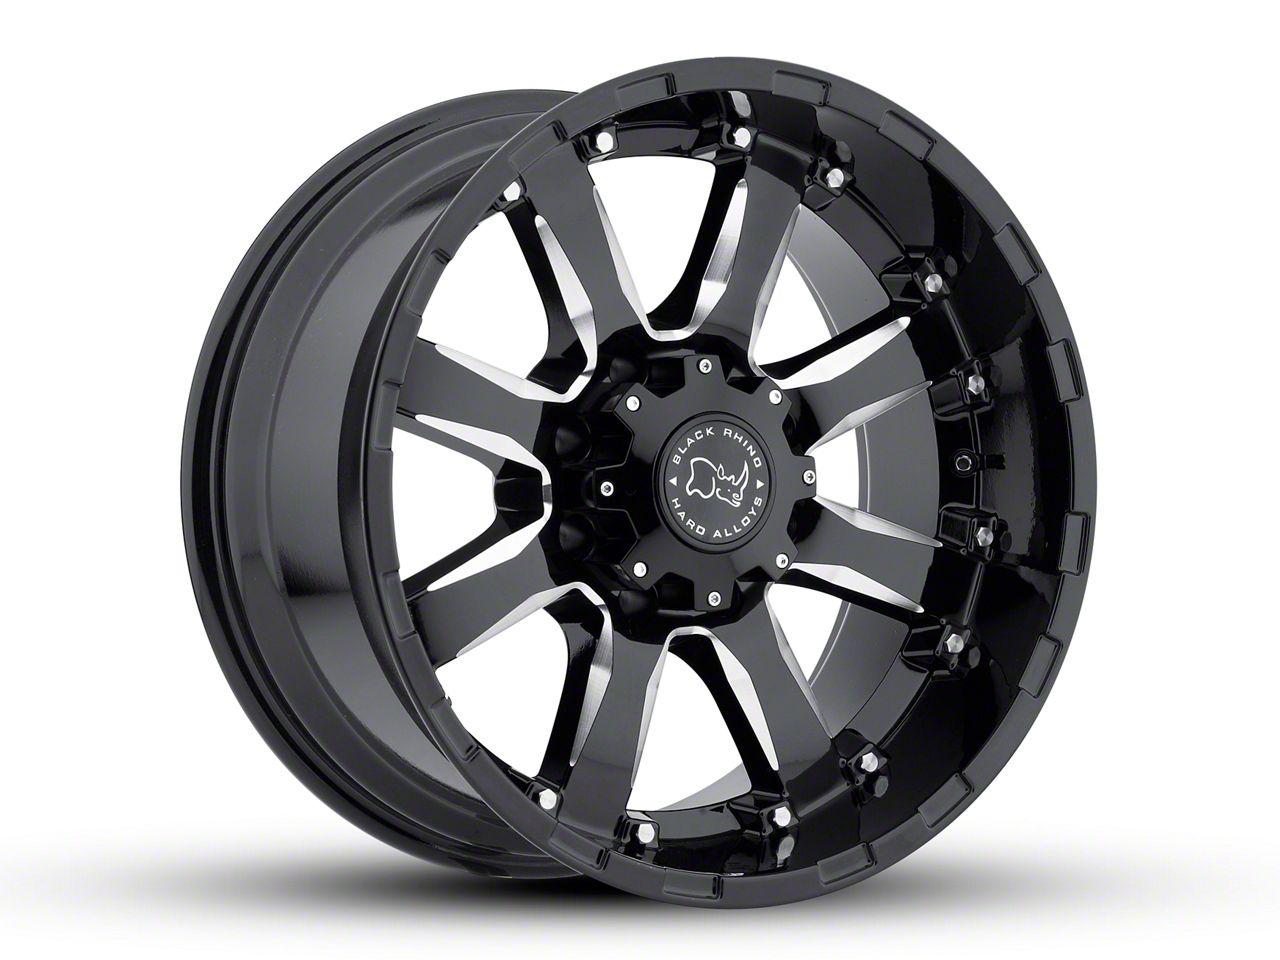 Black Rhino Sierra Gloss Black Milled 5-Lug Wheel - 20x9 (02-18 RAM 1500, Excluding Mega Cab)